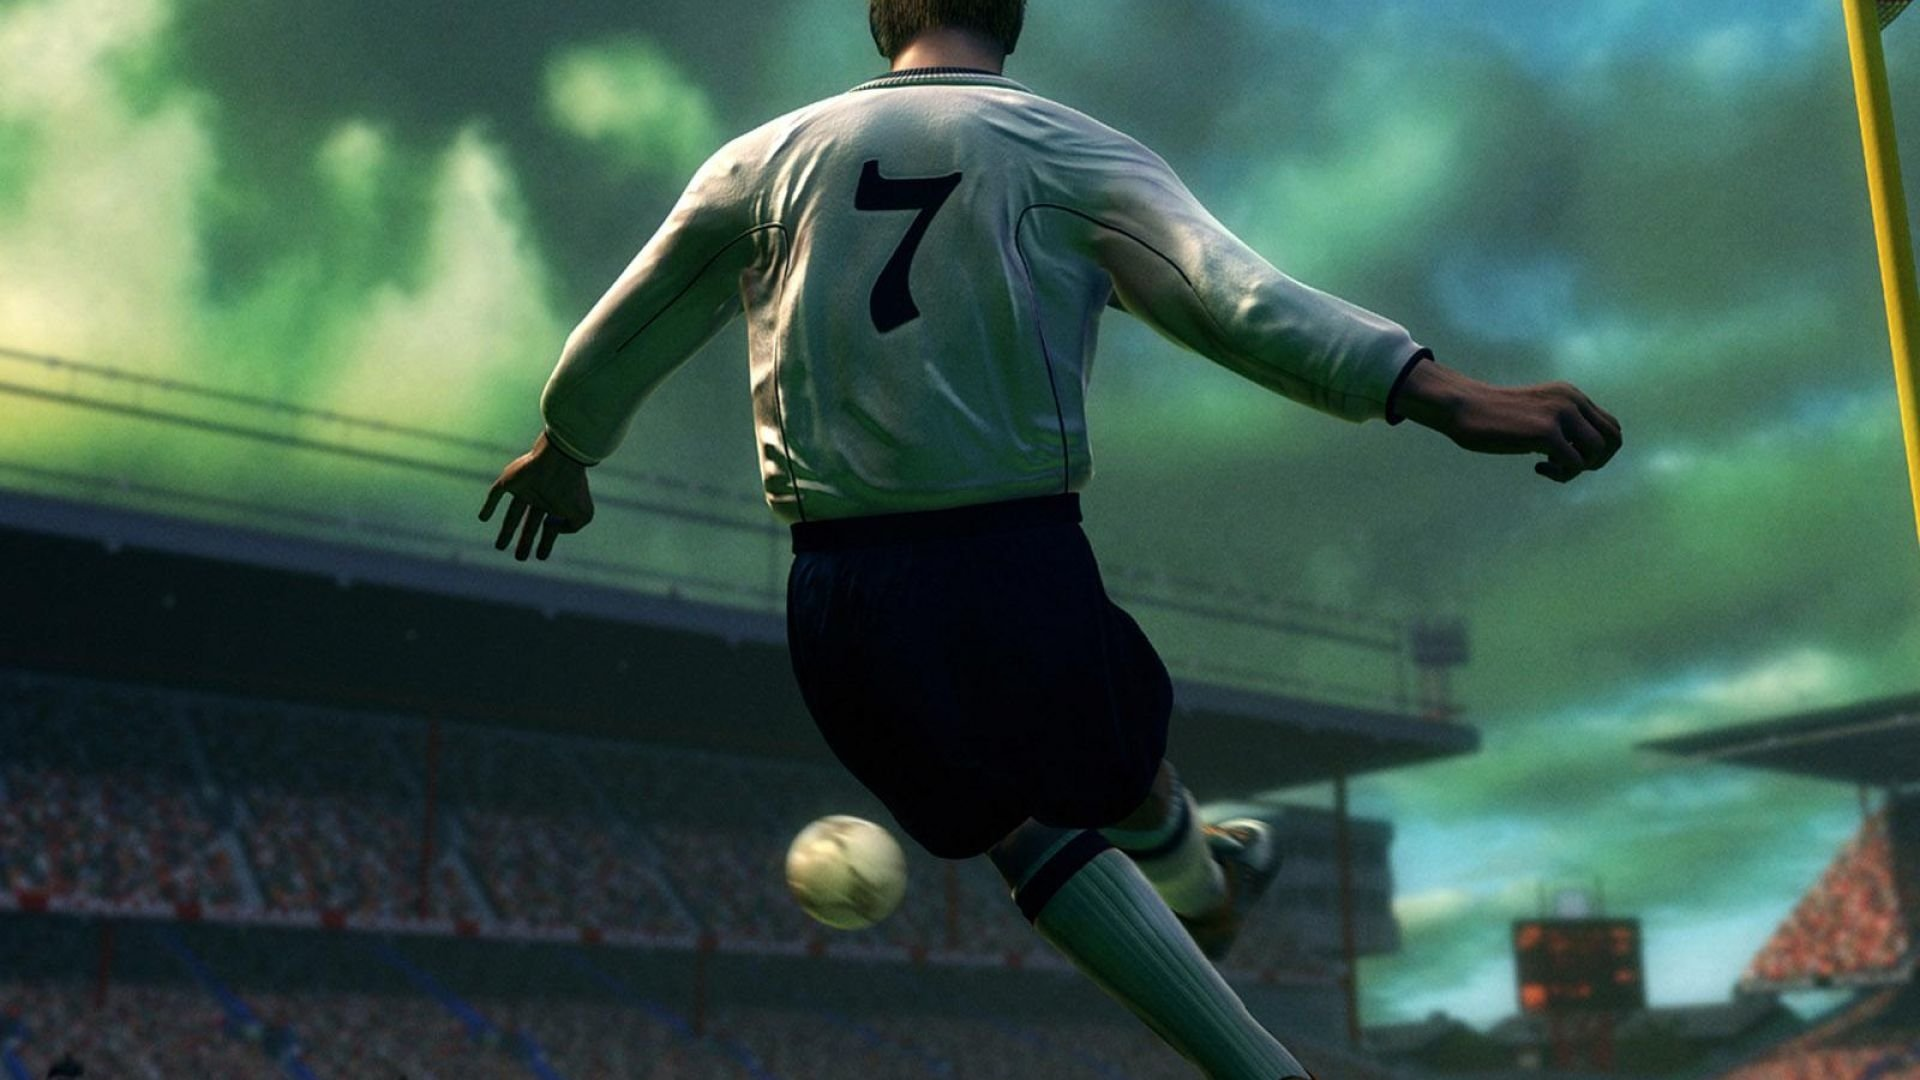 Soccer Wallpapers Backgrounds Pro: Pro Evolution Soccer 2 HD Wallpaper